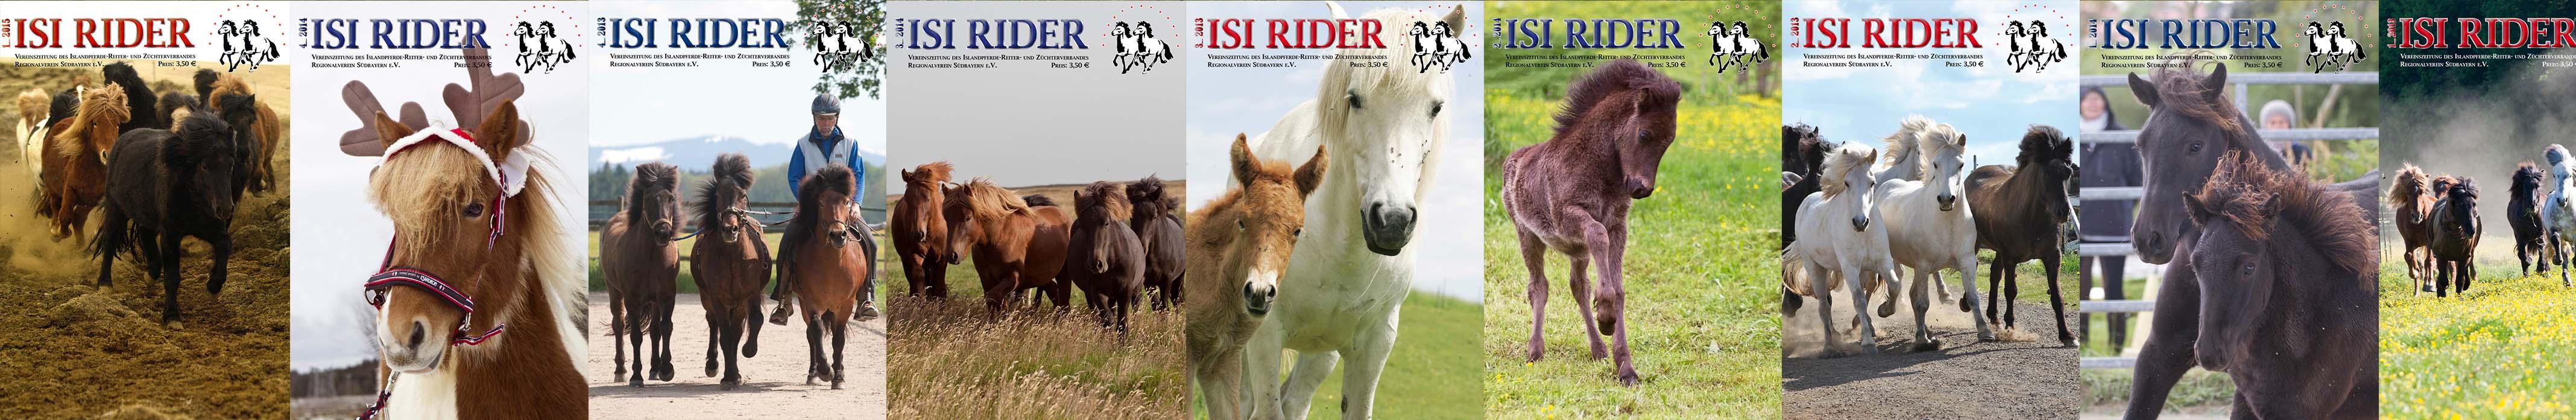 Banner Isi Rider